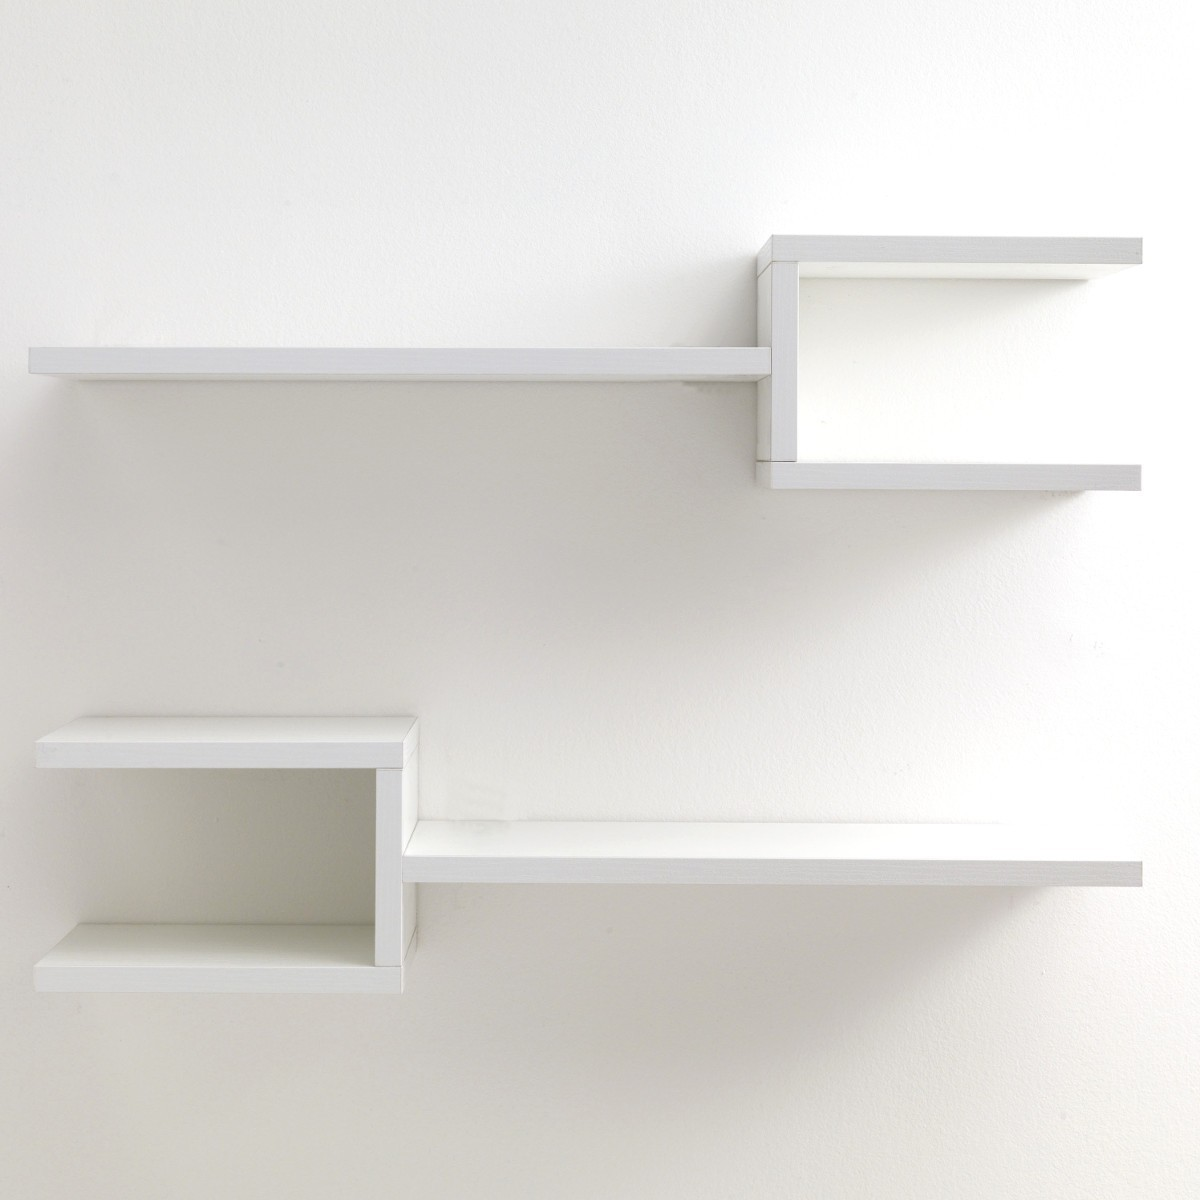 Coppia mensole da parete frequencyb in legno bianco 75 cm - Mensole cucina moderna ...